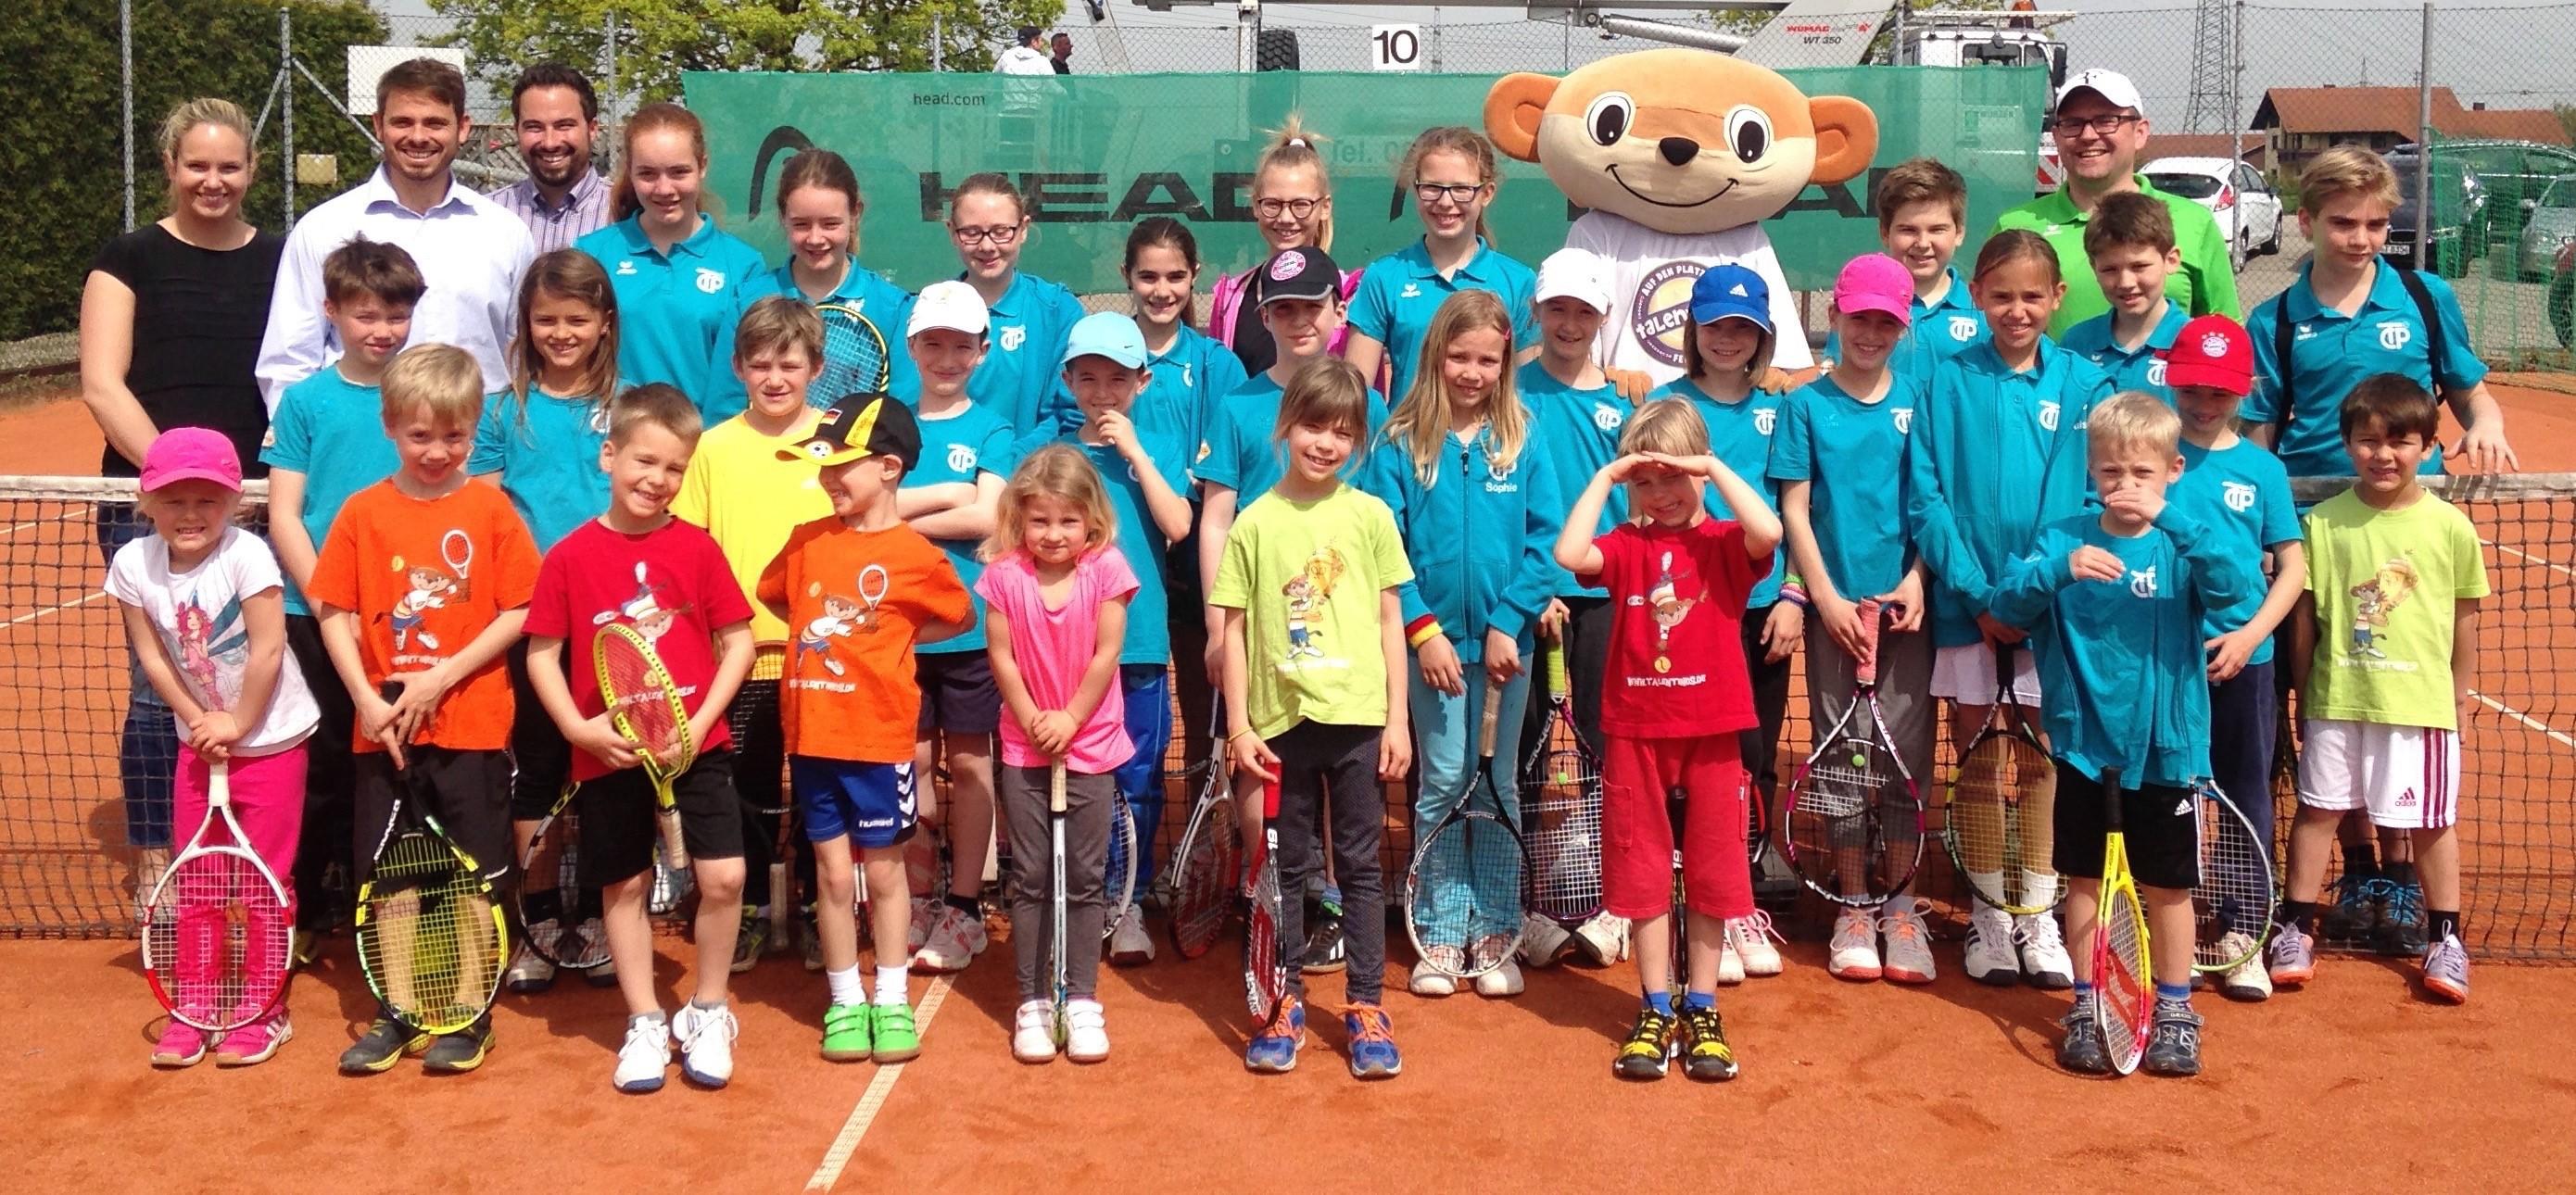 Ziele des Vereins – Tennis-Club Pliening e.V.